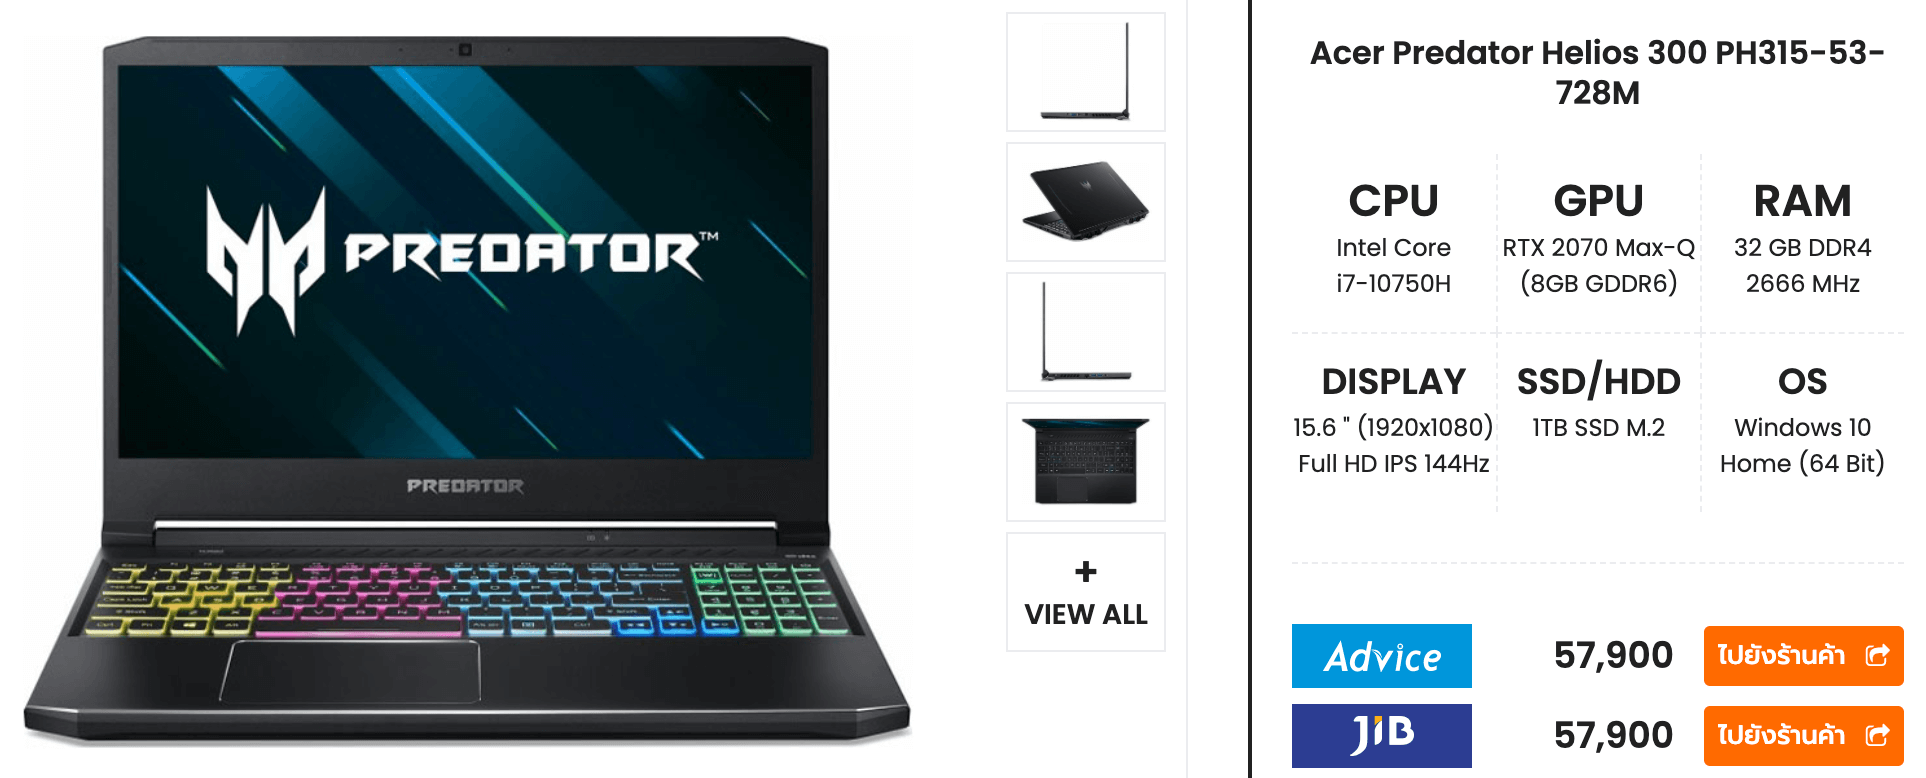 Acer Predator Helios 300 PH315 53 728M 1